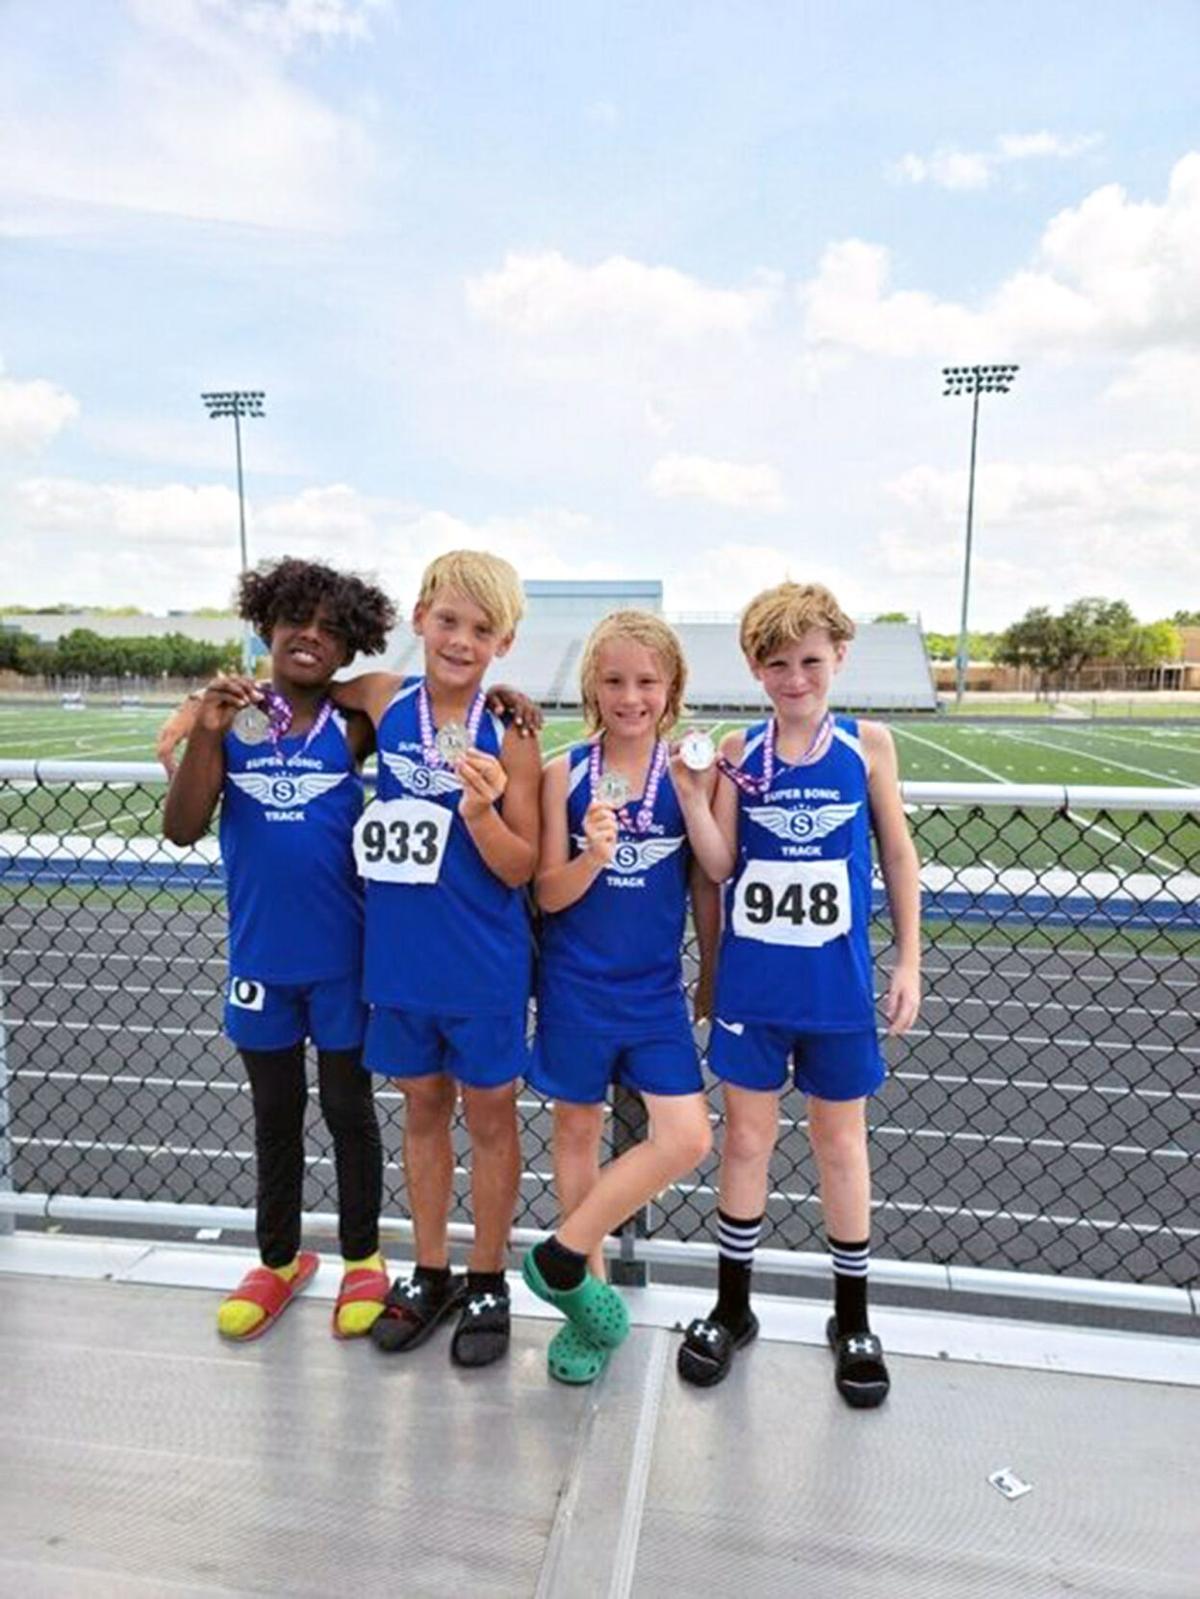 4x400 relay Austin Young-Caleb Inmon-Sawyer Loe-Carlito Richards.jpg